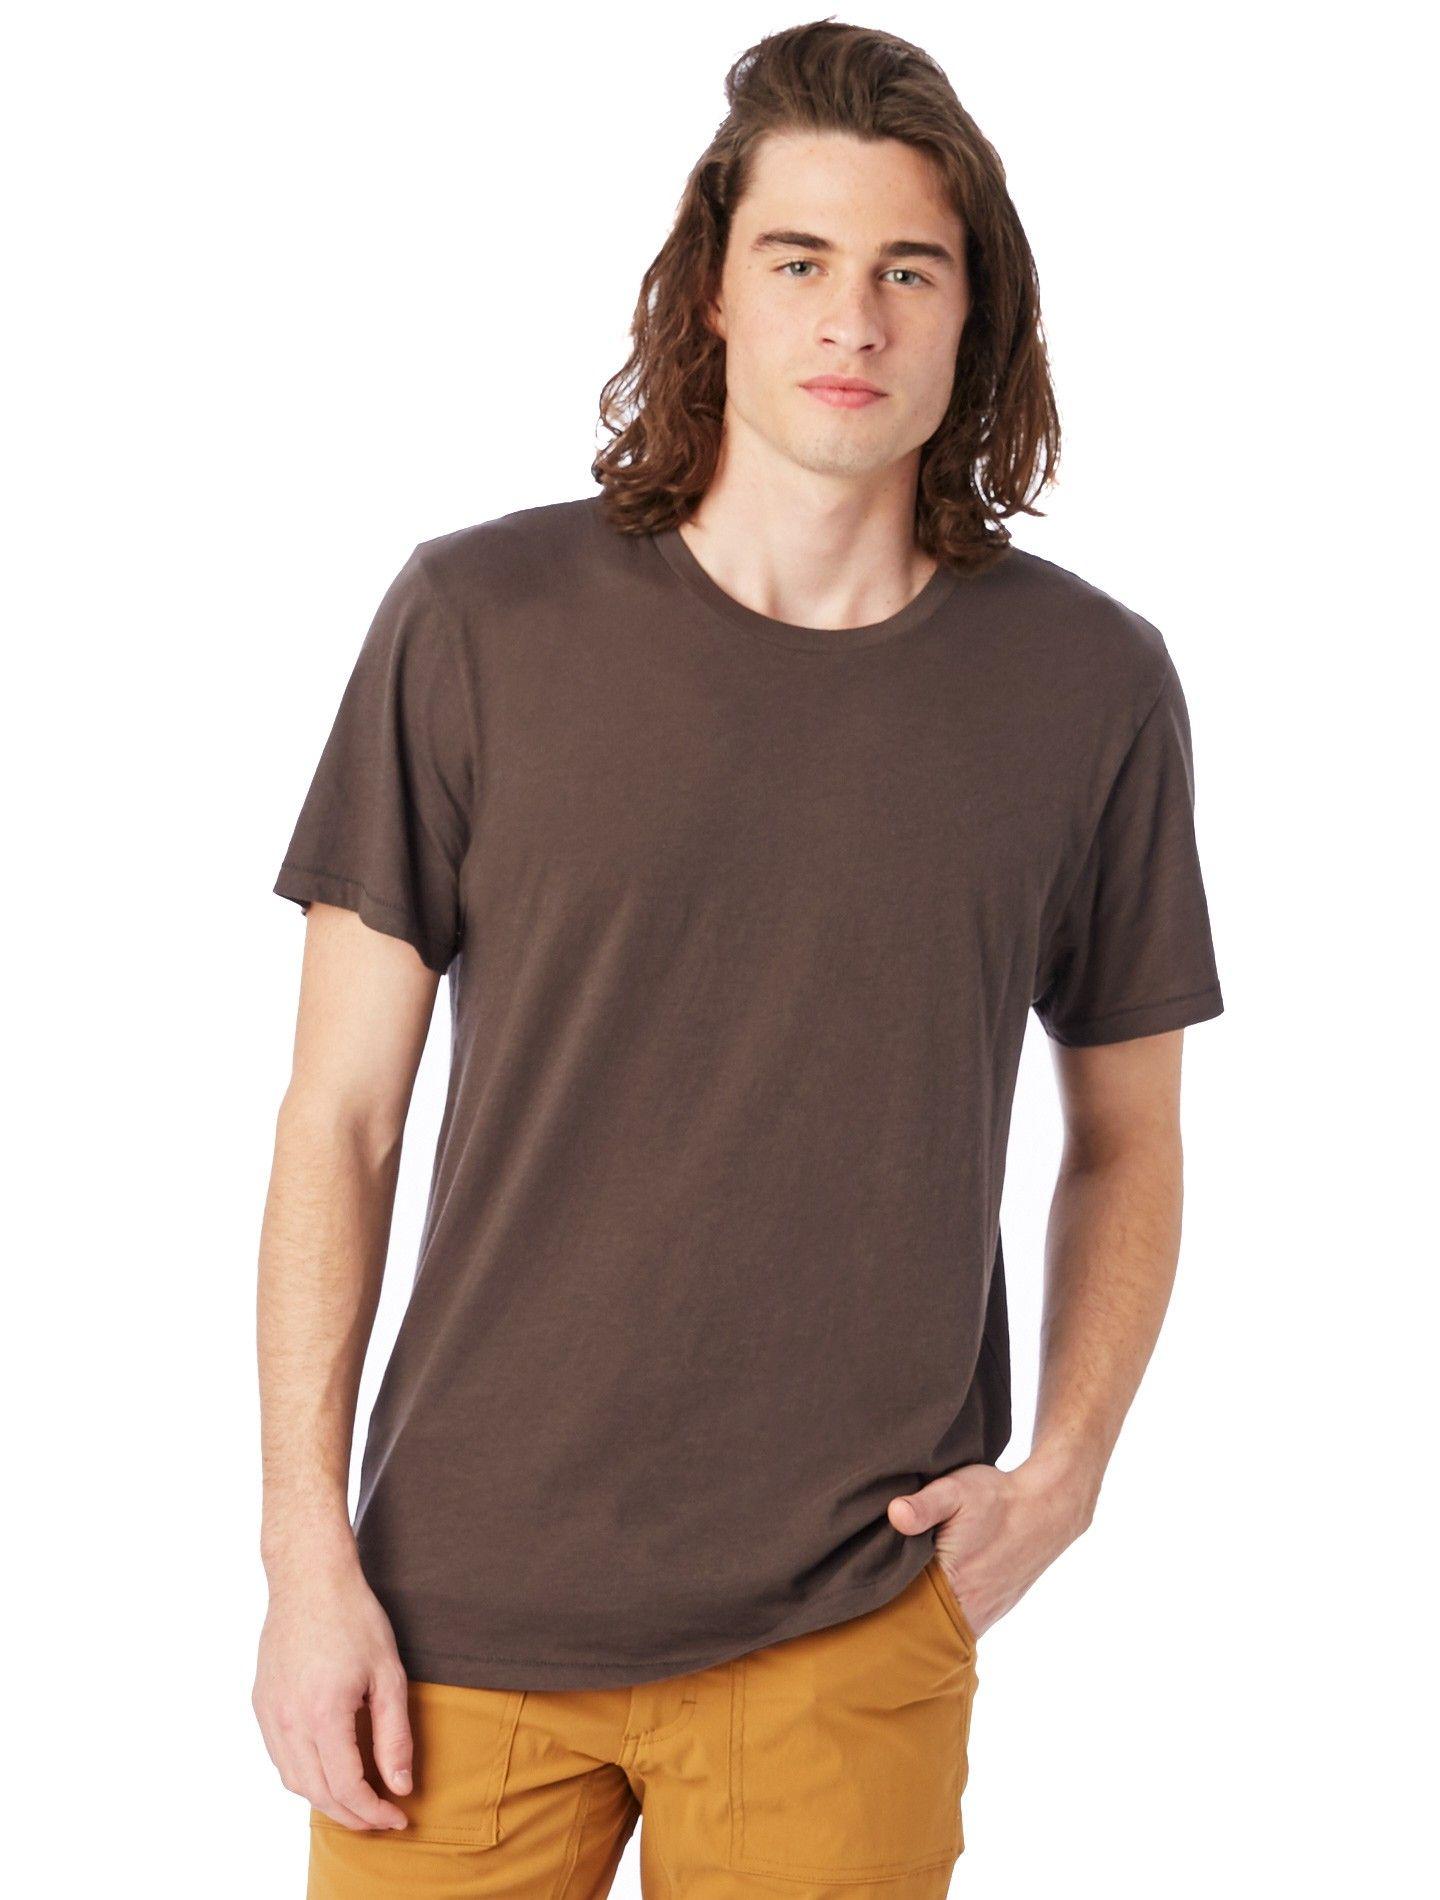 e995d7f708101 Alternative Apparel Organic Cotton Mens Crew T-Shirt - Xxs Earth Natural